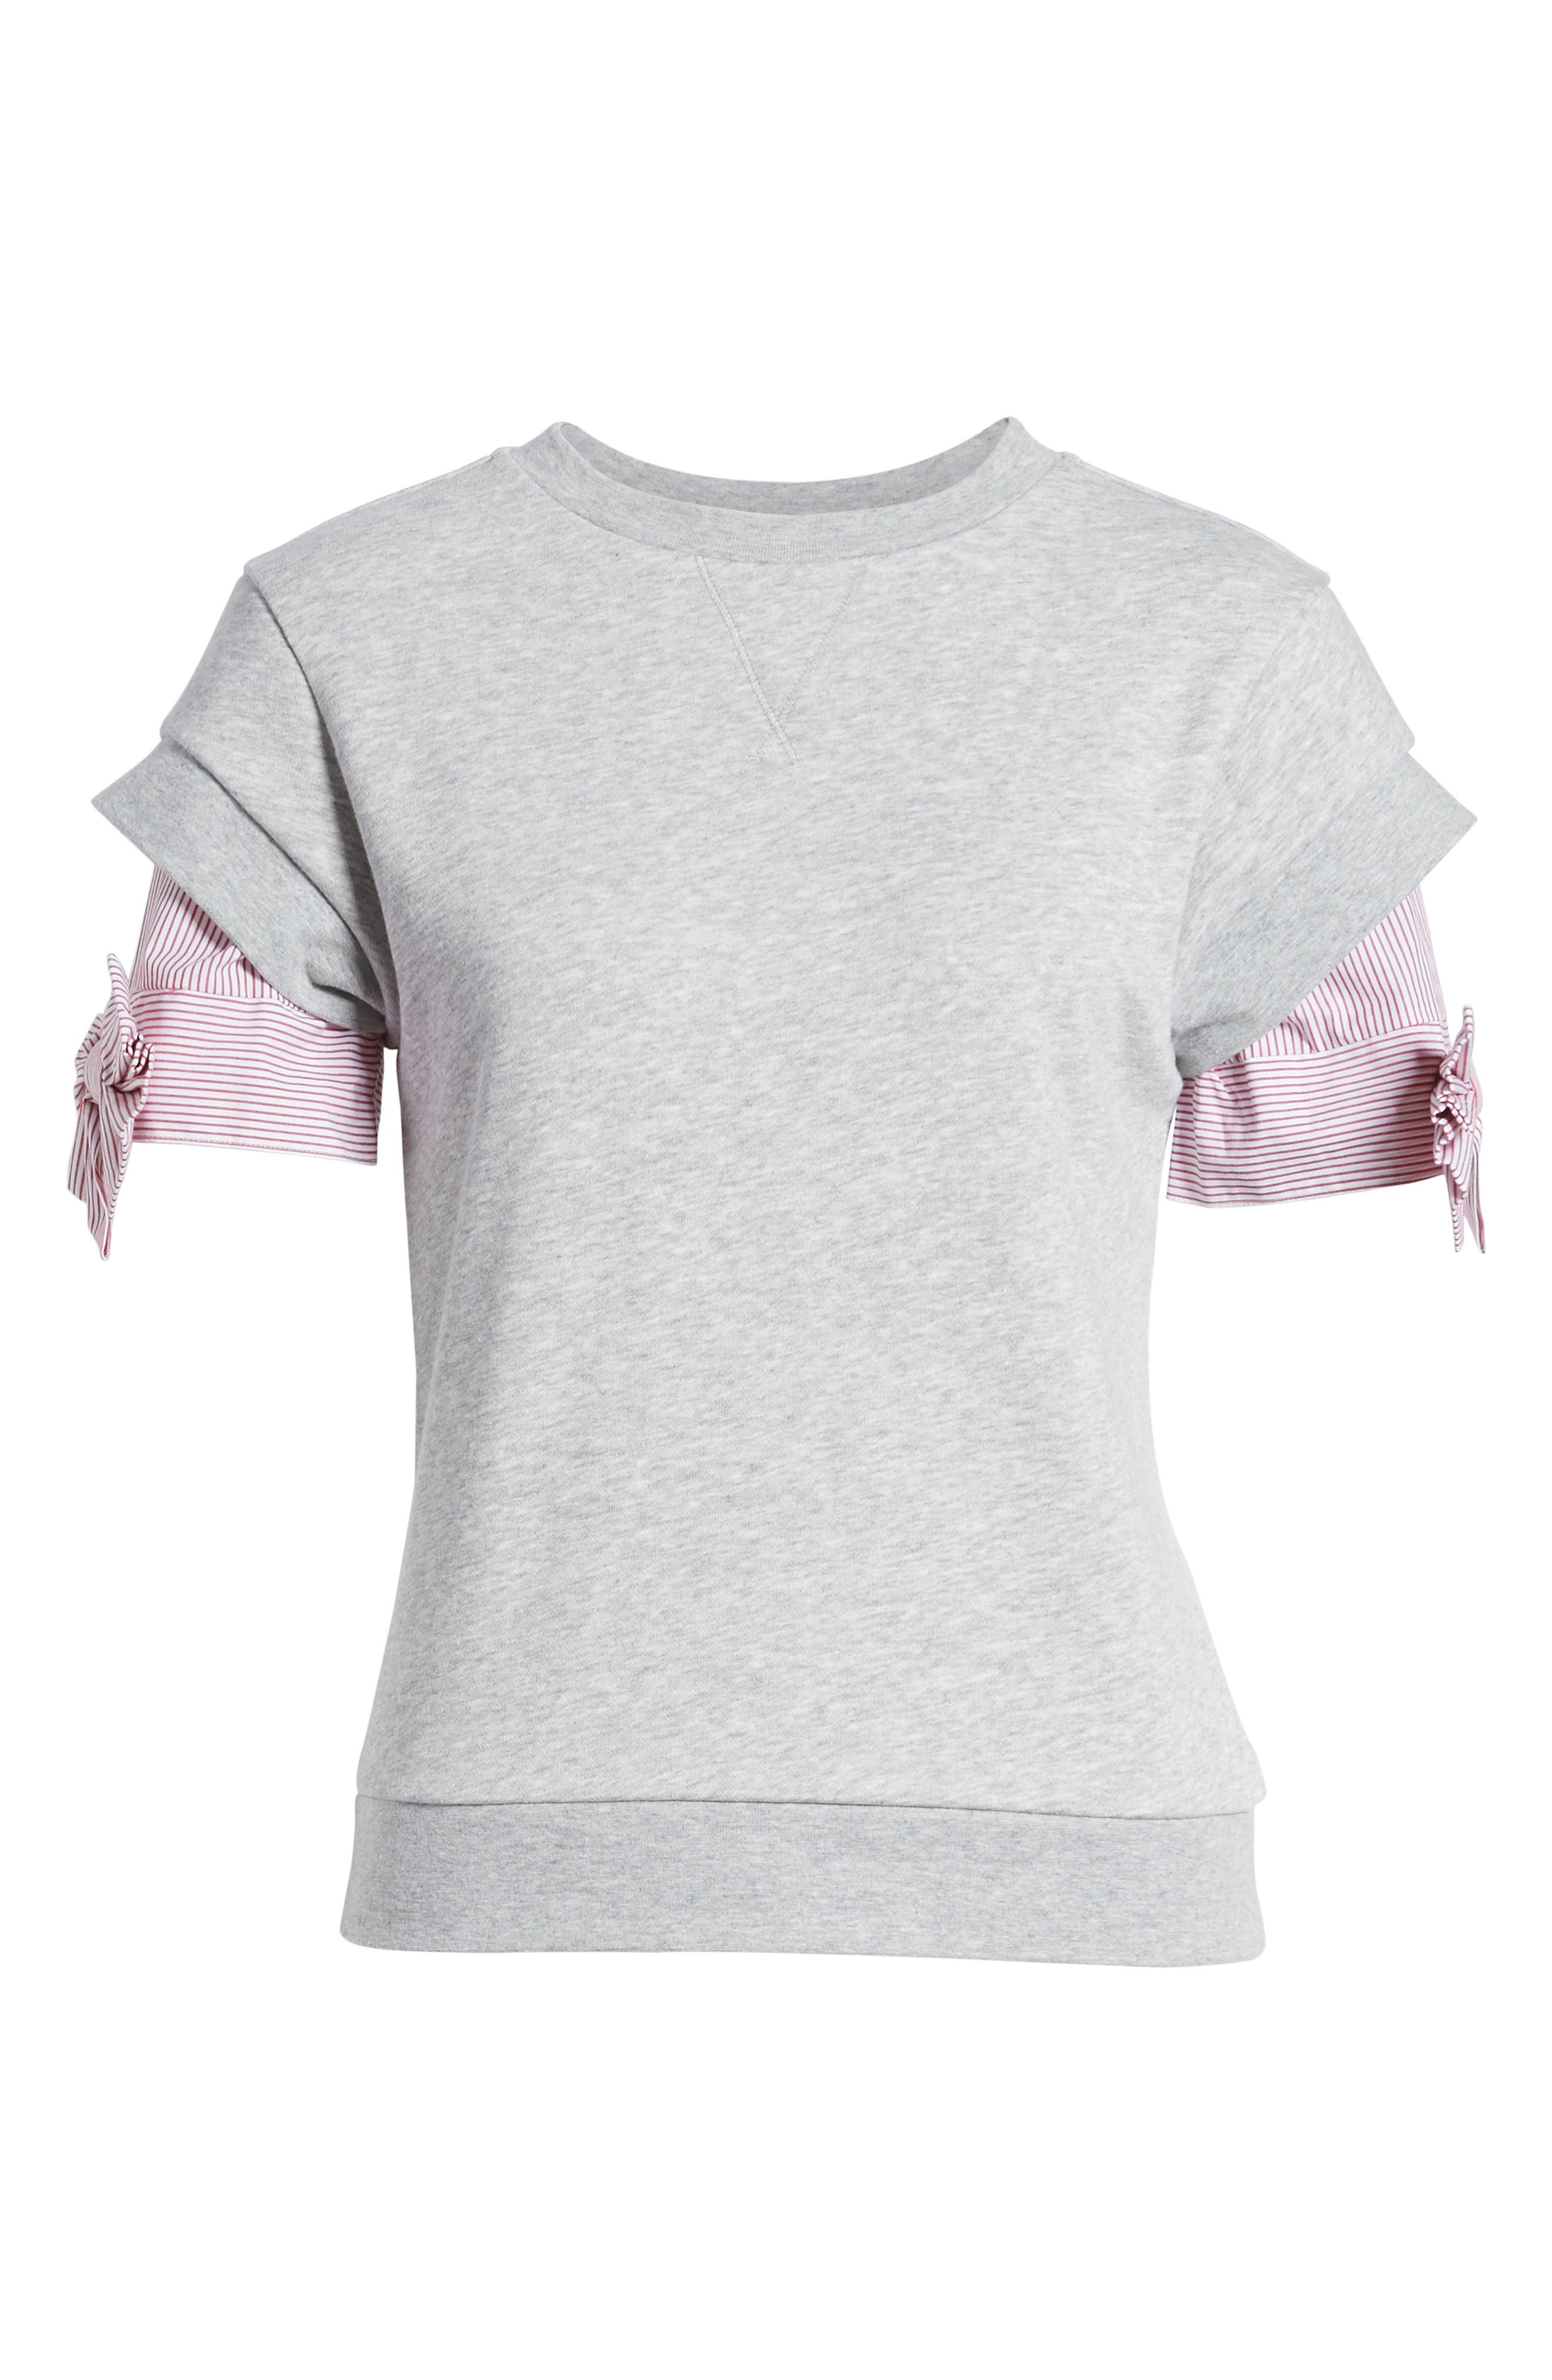 Bow Sleeve Sweatshirt,                             Alternate thumbnail 6, color,                             Grey Heather